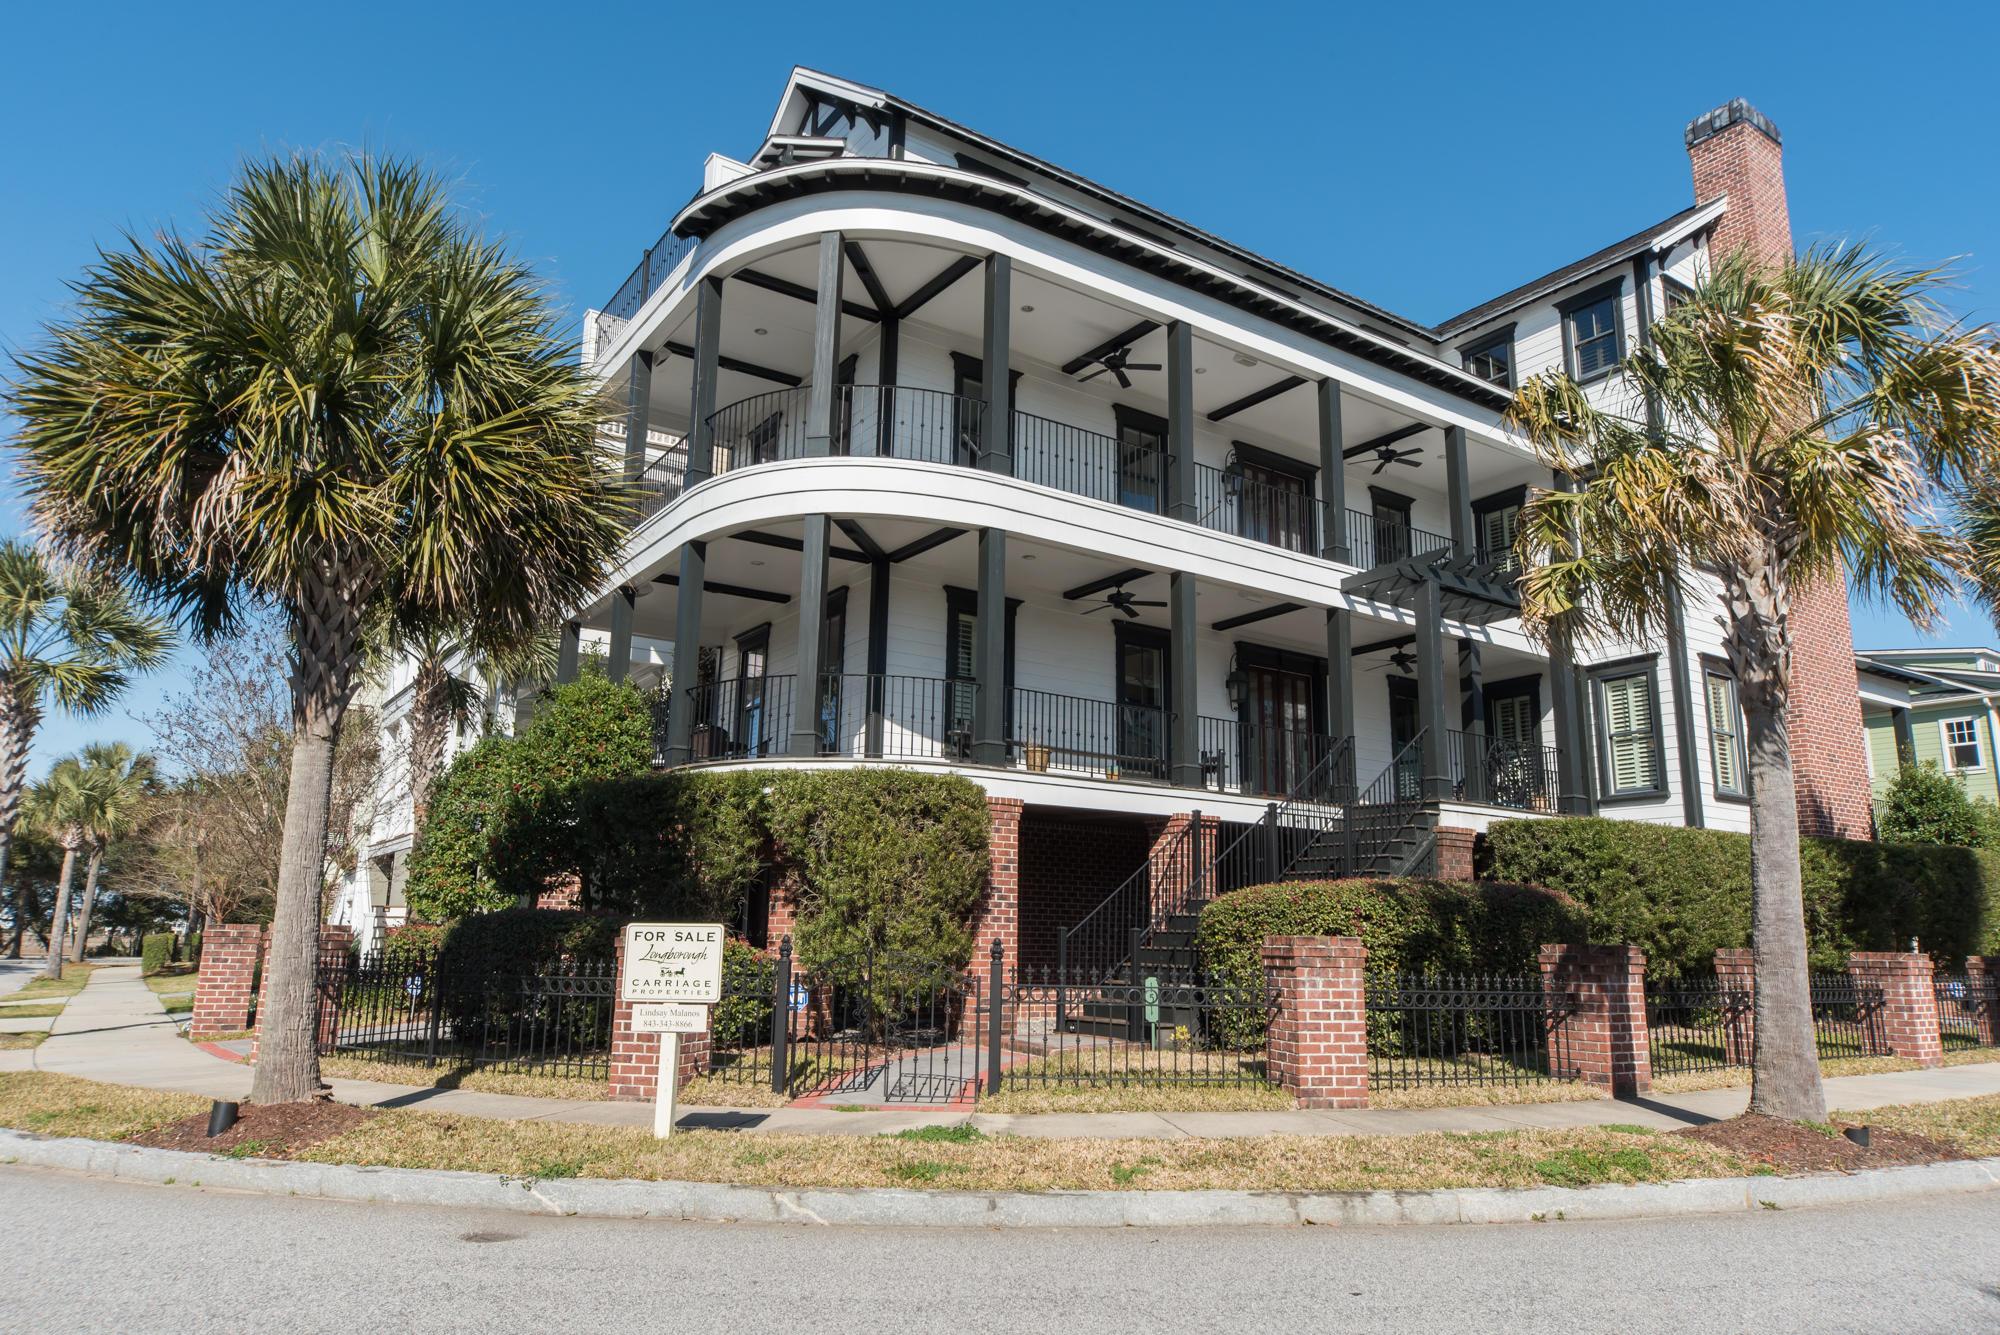 Photo of 151 Mary Ellen Dr, Charleston, SC 29403